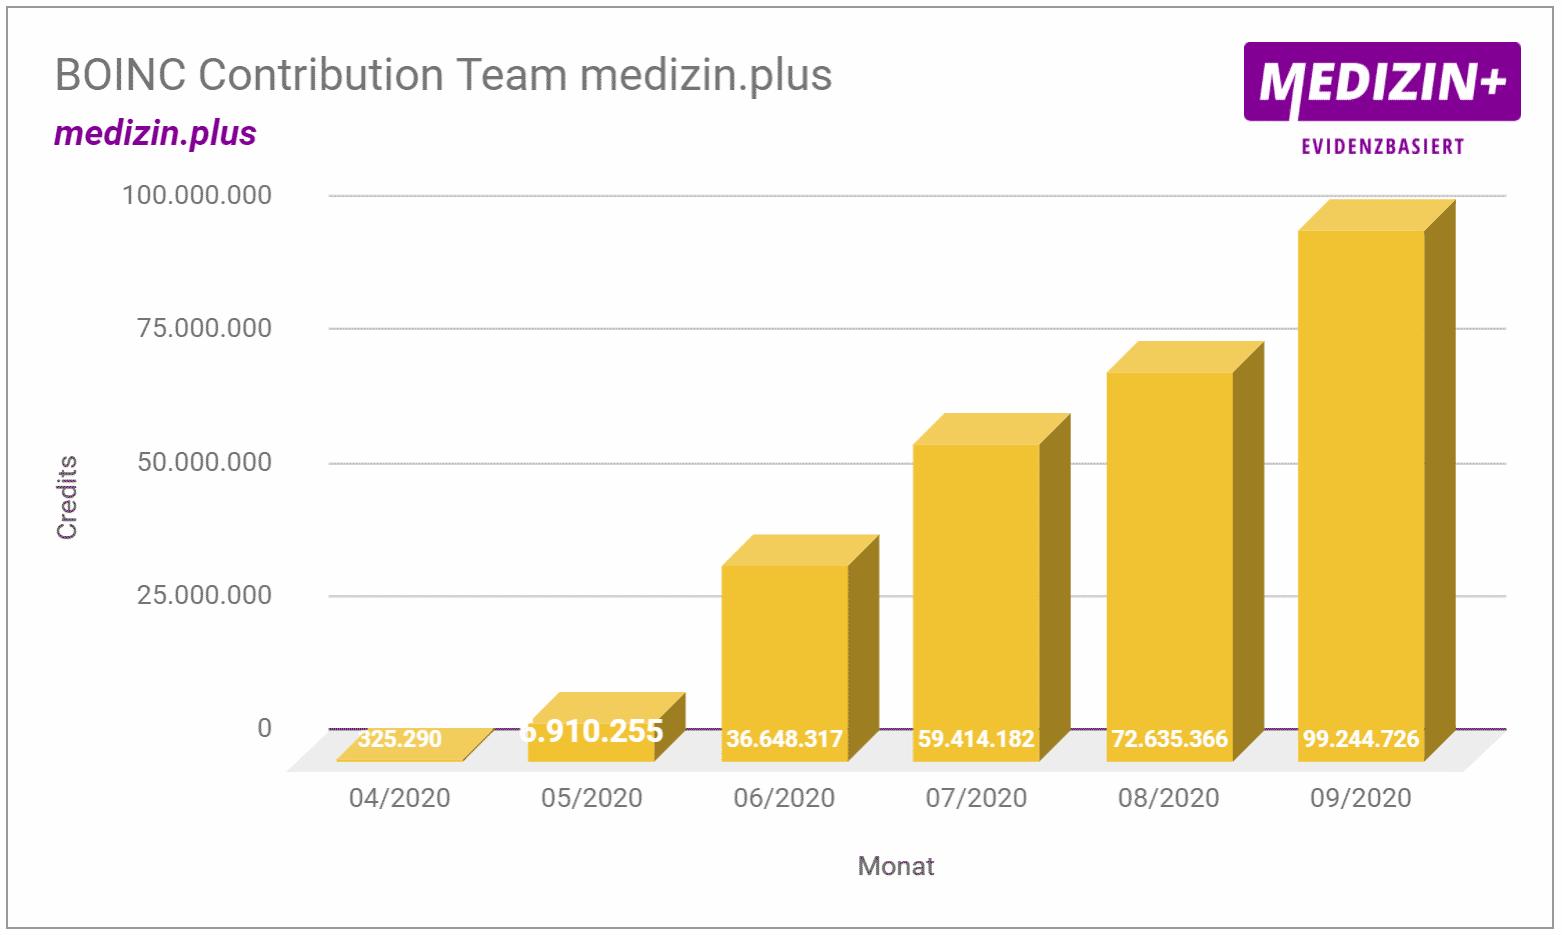 BOINC Statistik Medizin.plus Team